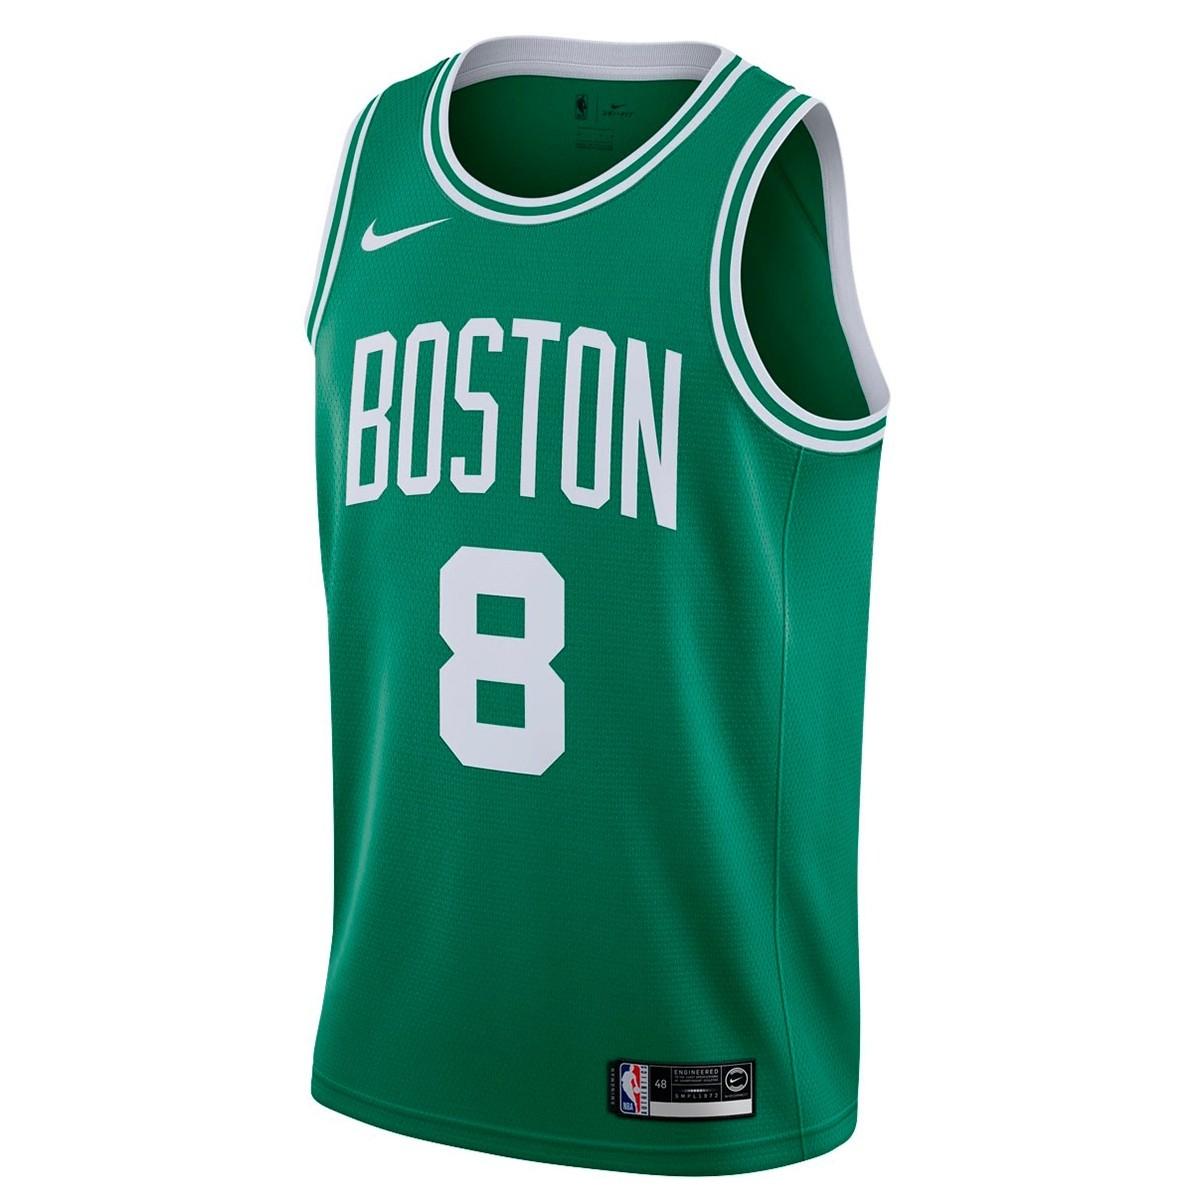 Nike Junior NBA Celtics Swingman Jersey Walker 'Icon Edition'